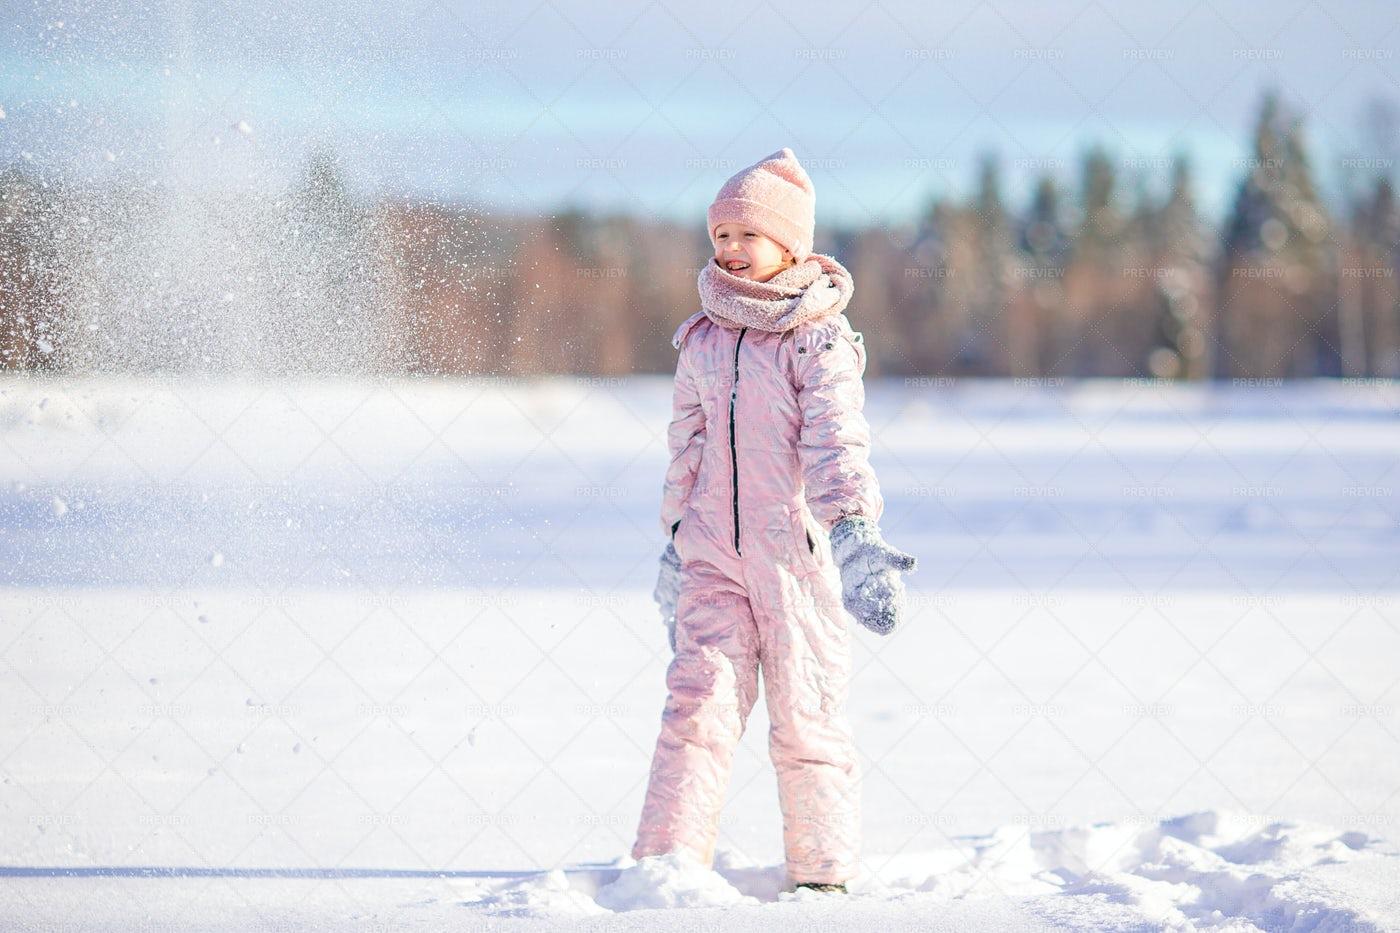 Tossing Loose Snow: Stock Photos